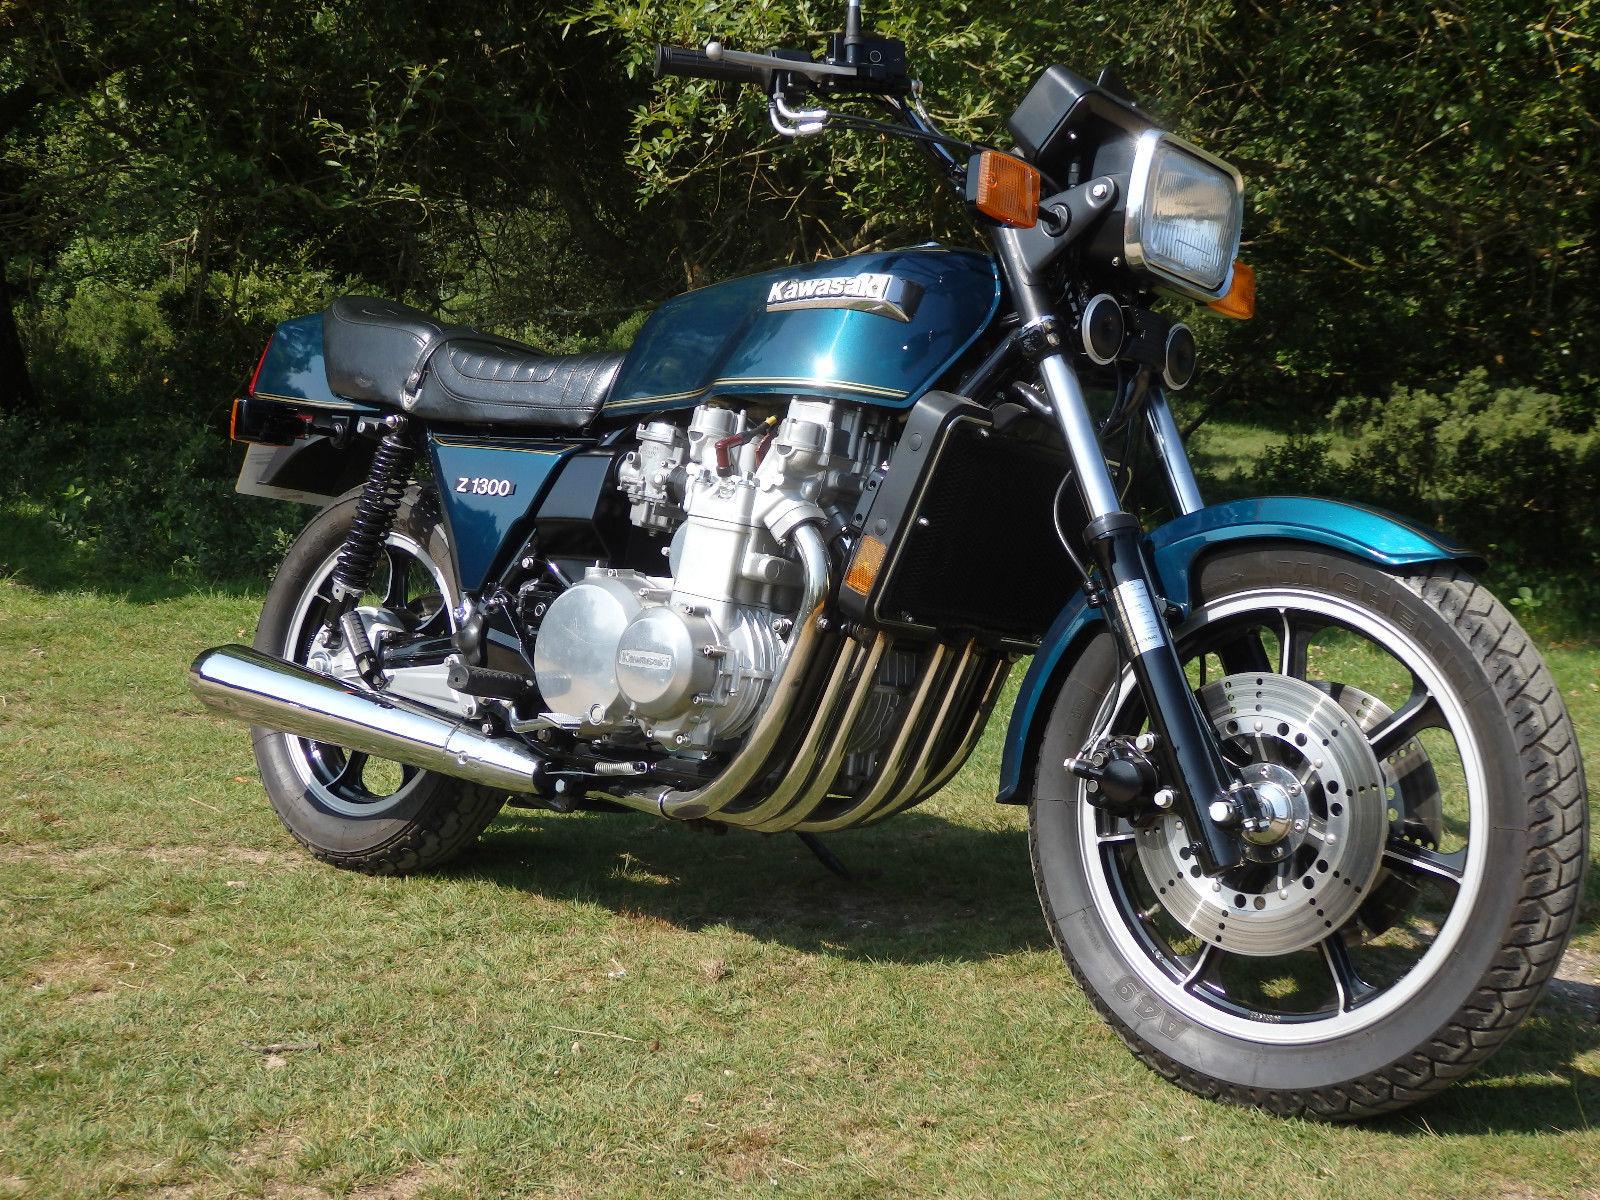 Kawasaki Z1300 Kz1300 1979 Restored